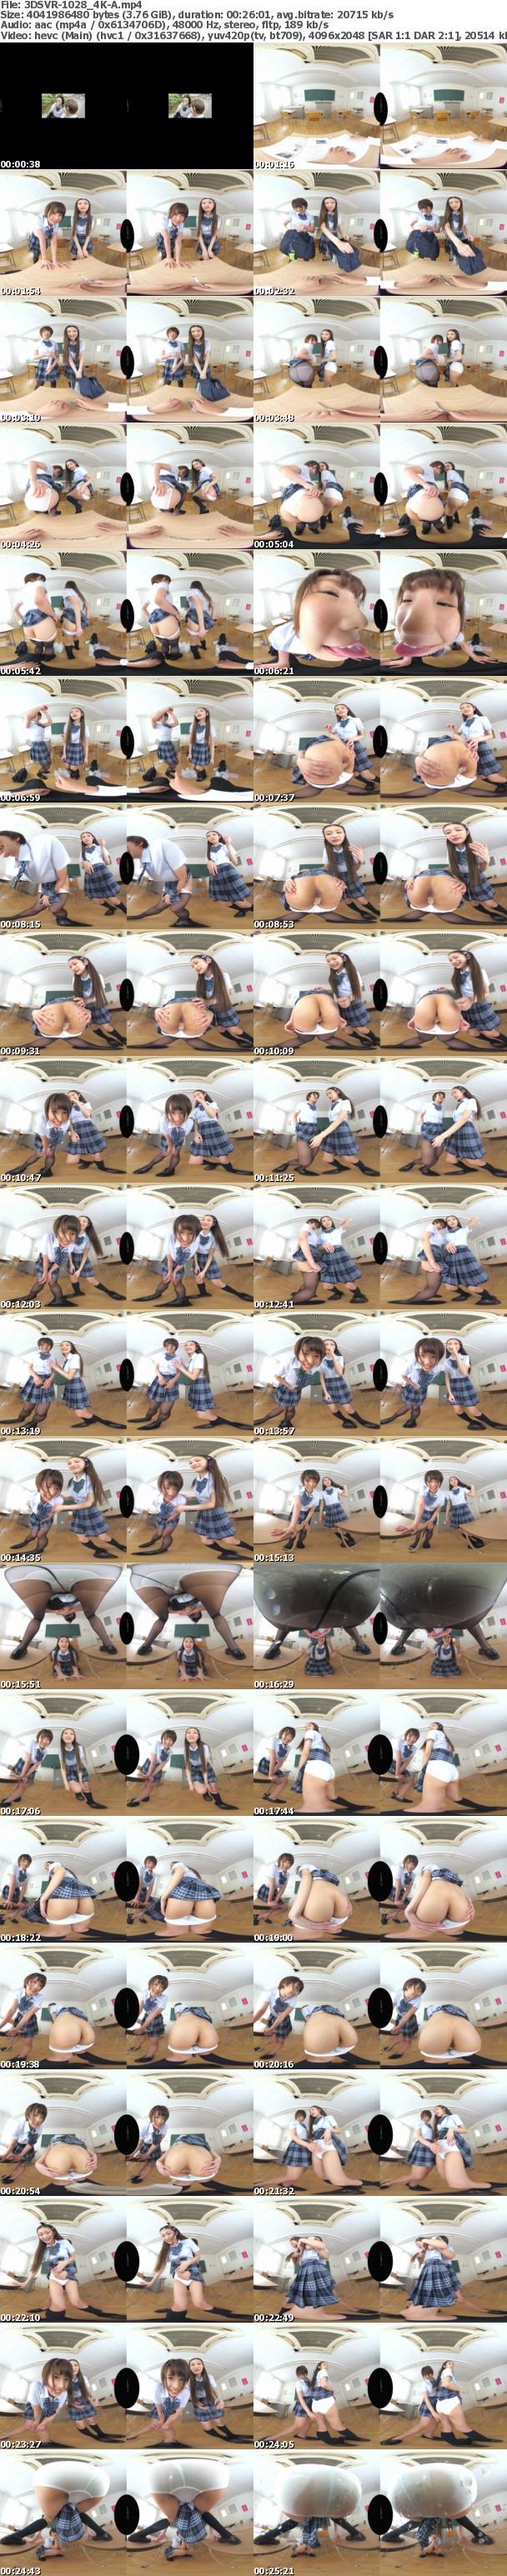 (VR) (4K) 3DSVR-1028【4KHQ】同級生のアナルから噴射する牛乳が顔面にブッかかりまくる! 牛乳浣腸ぶっかけVR 増量スペシャル